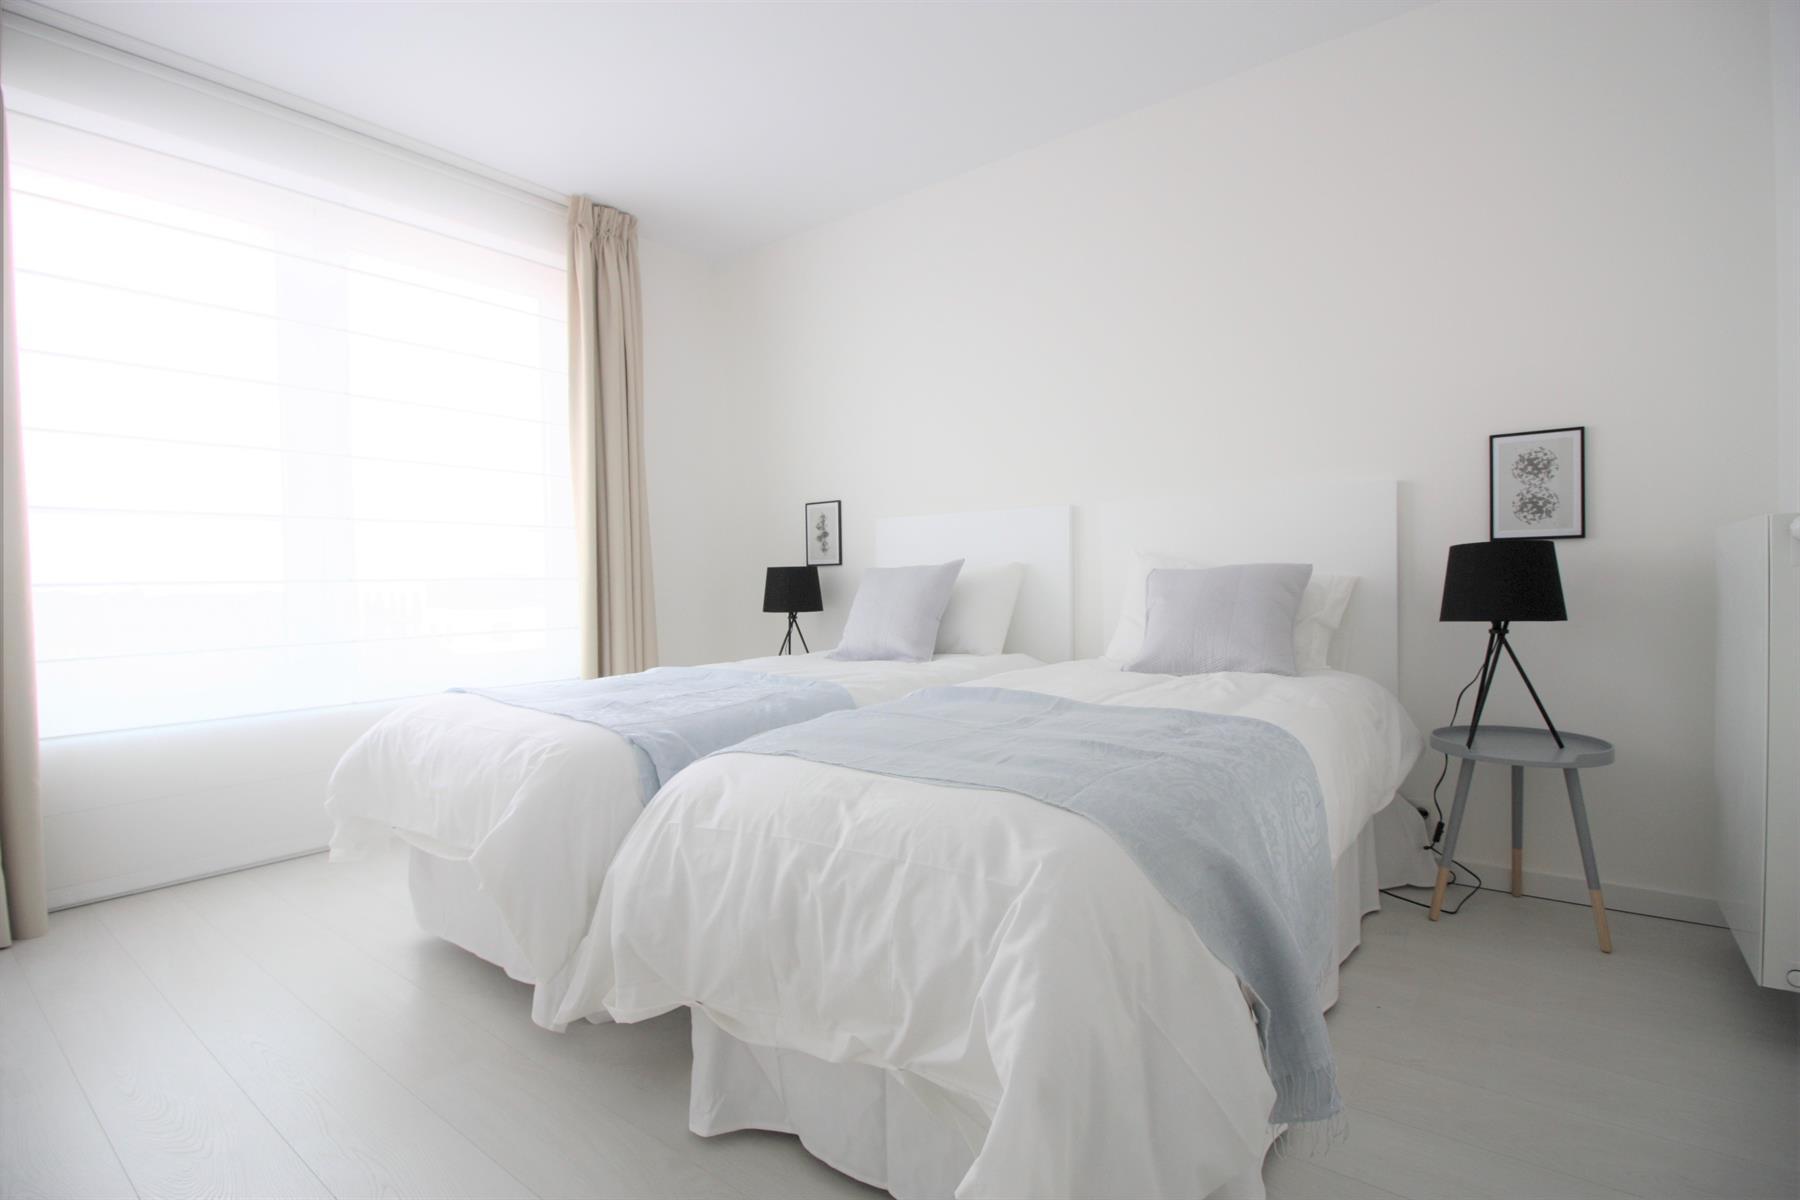 Appartement - Woluwe-Saint-Lambert - #4092446-8